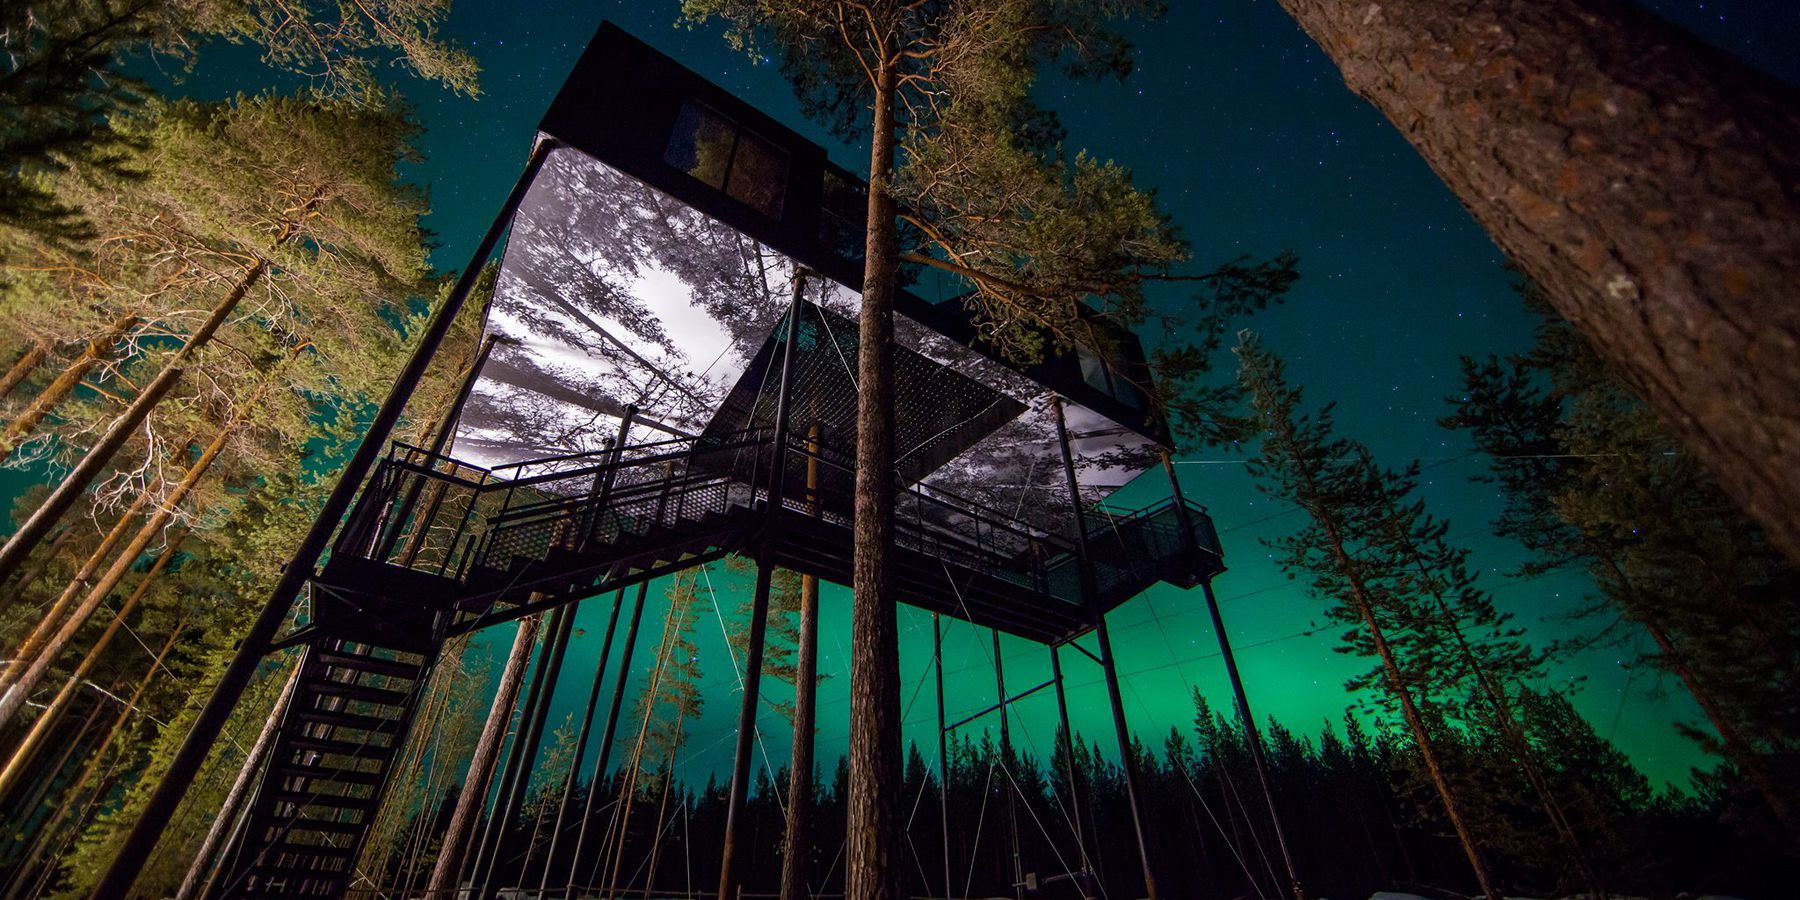 Treehotel in Zweden - Vakantie Zweden - Doets Reizen